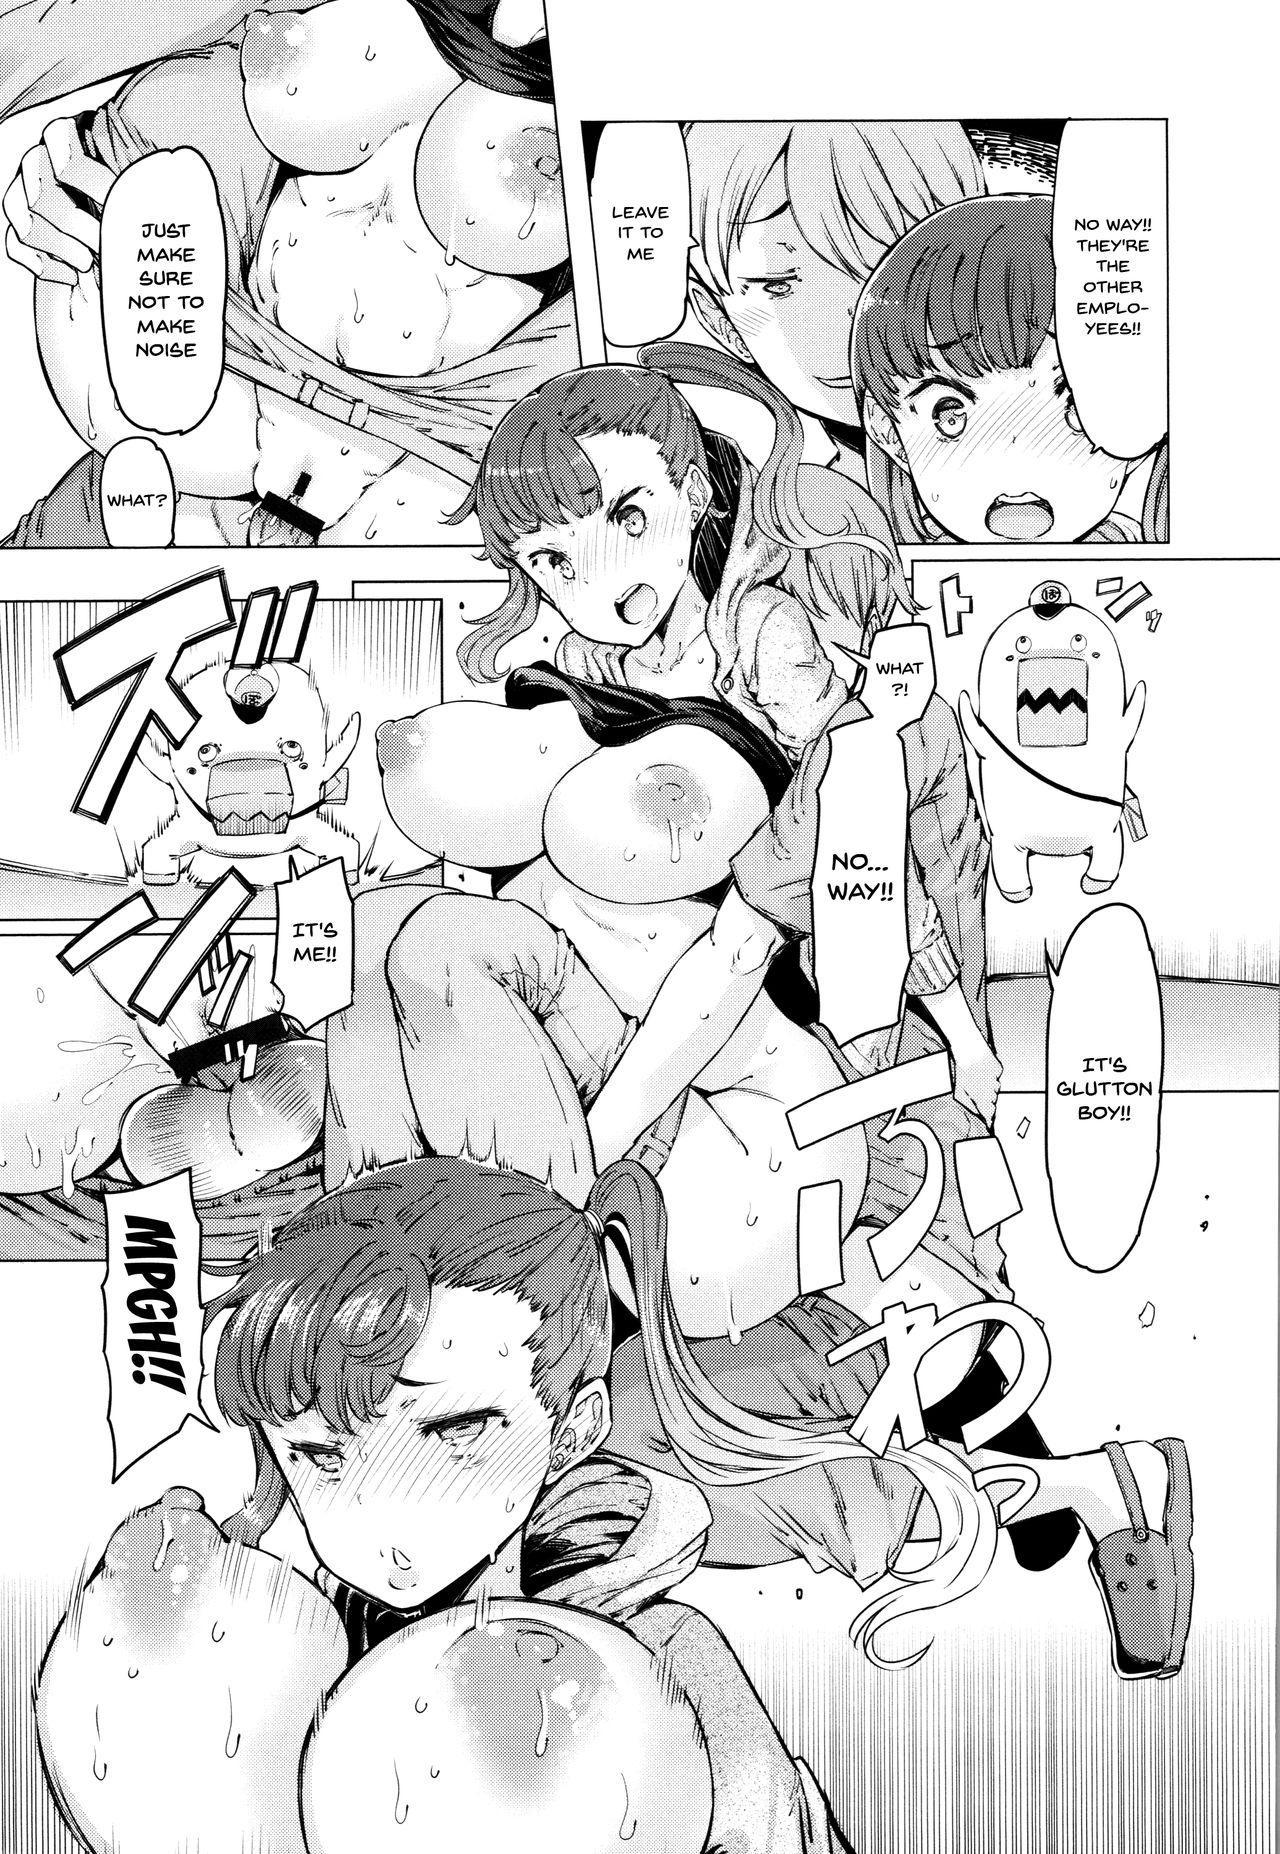 Hitozuma ga Ero Sugite Shigoto ni Naranai! | These Housewives Are Too Lewd I Can't Help It! Ch.1-3 34